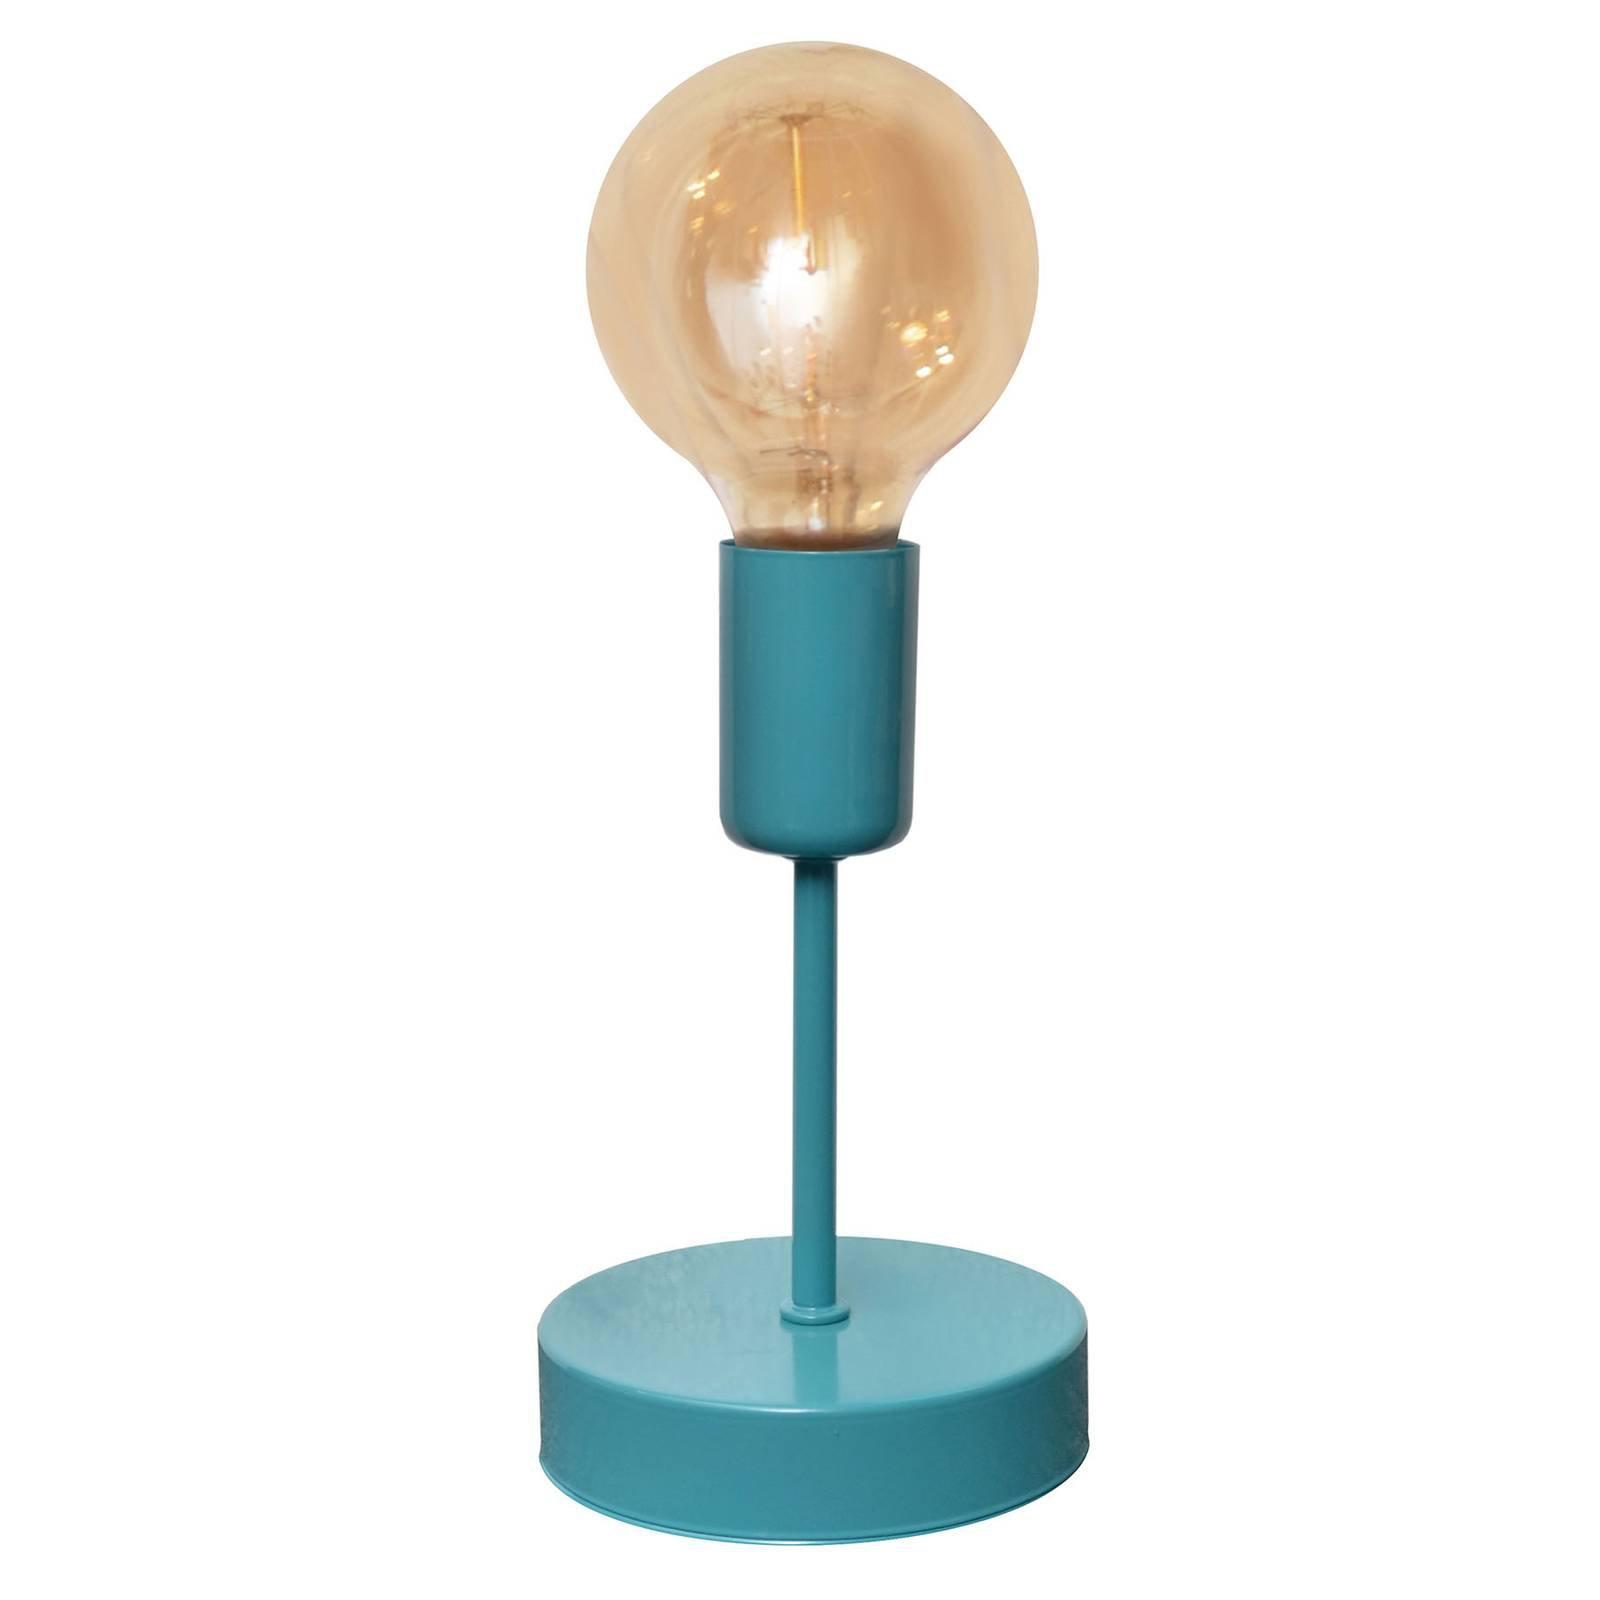 Fargerik bordlampe Oxford, turkis